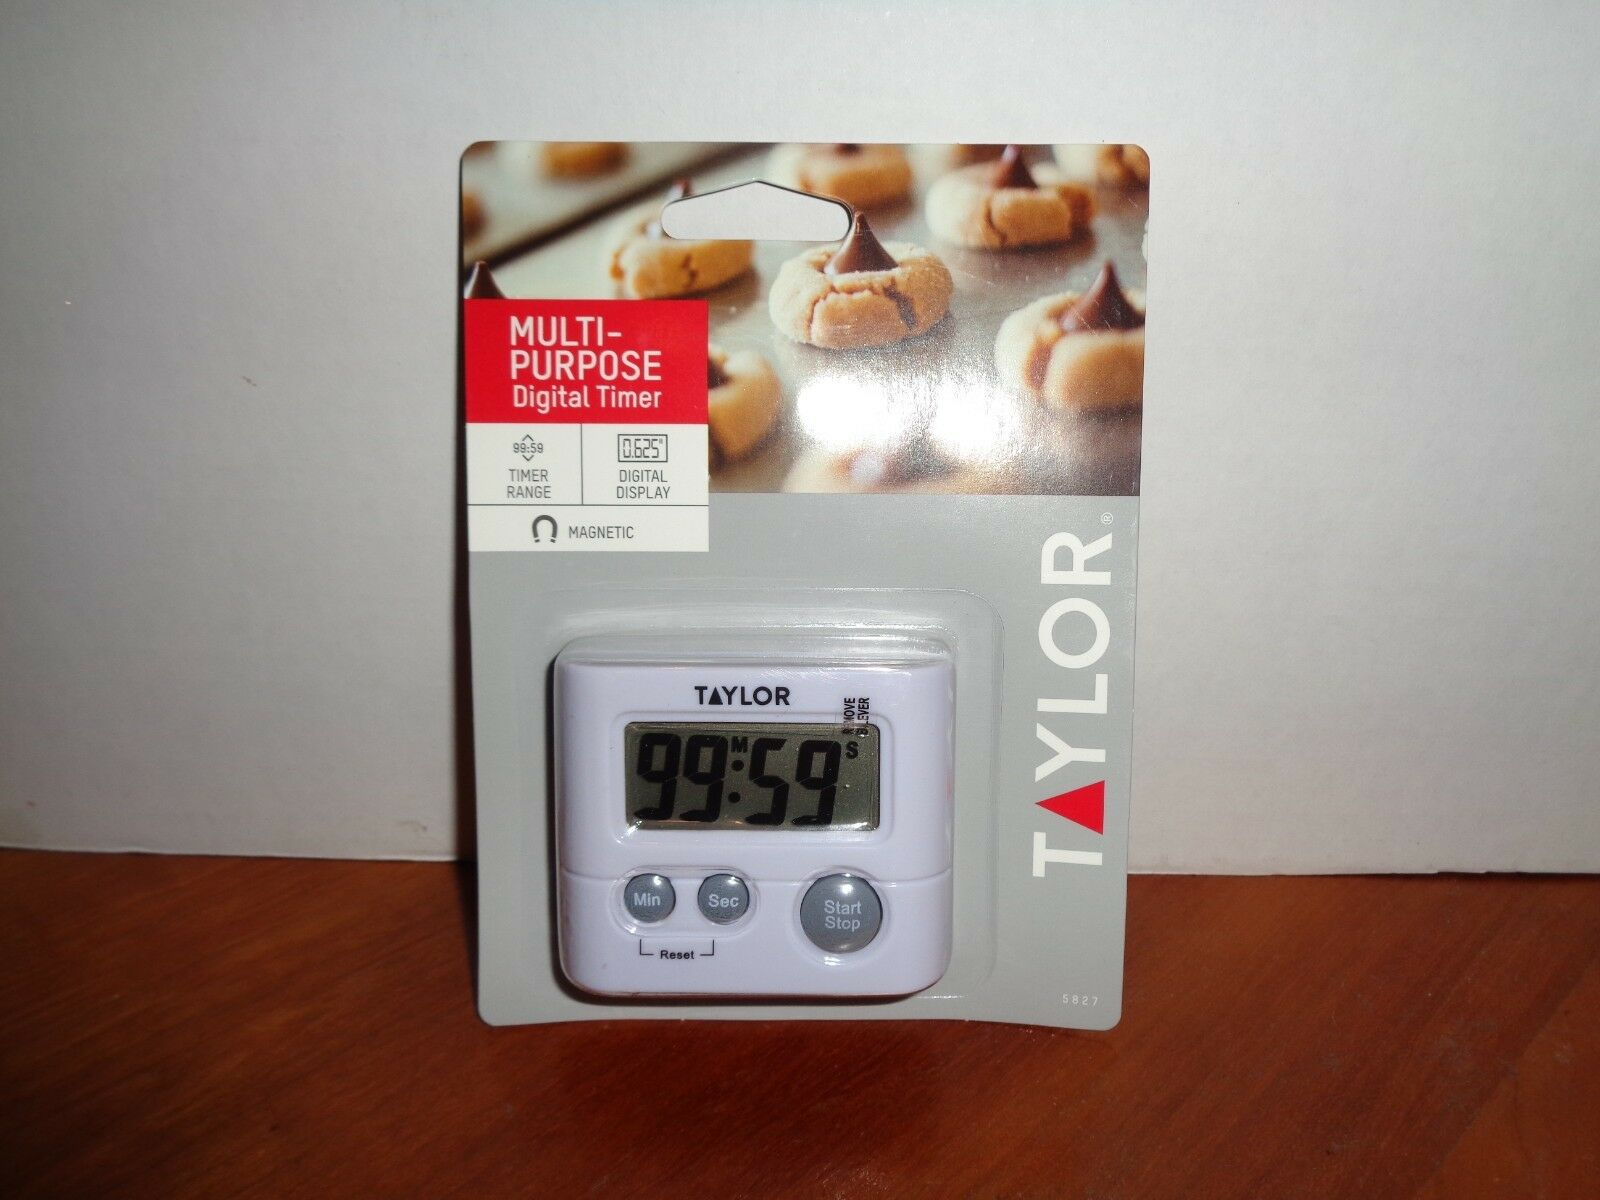 Taylor Low Priced Digital Kitchen Timer